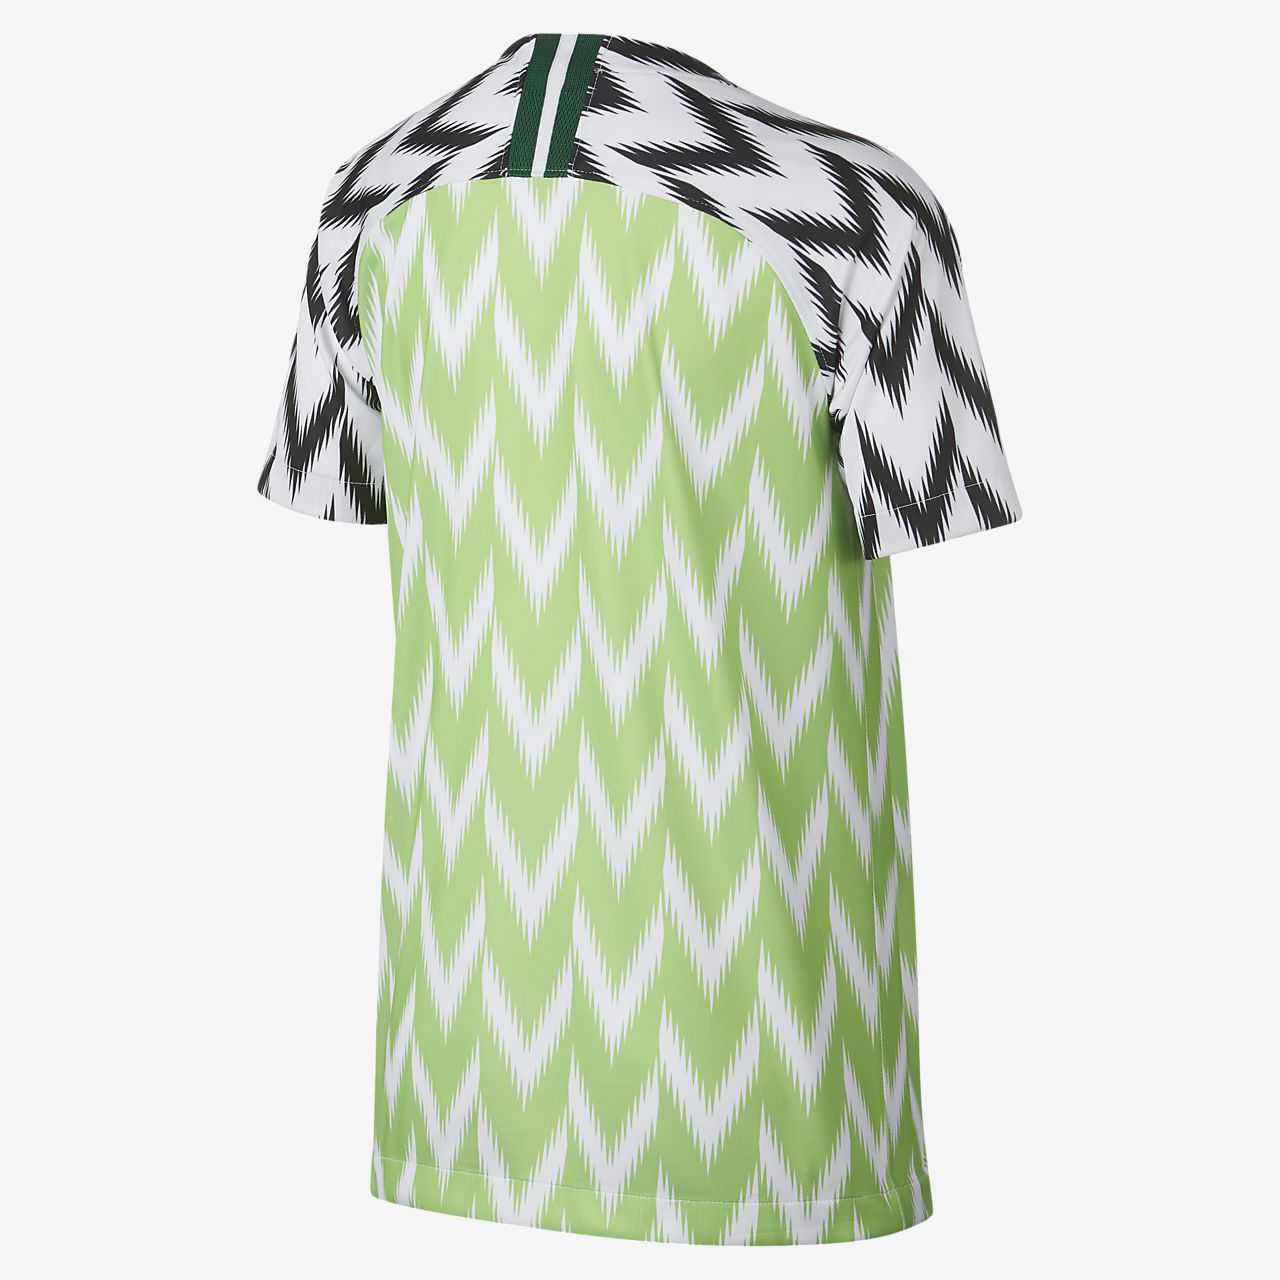 2db0a7626 Nigeria 2019 Stadium Home Kids  Soccer Jersey. Nike.com